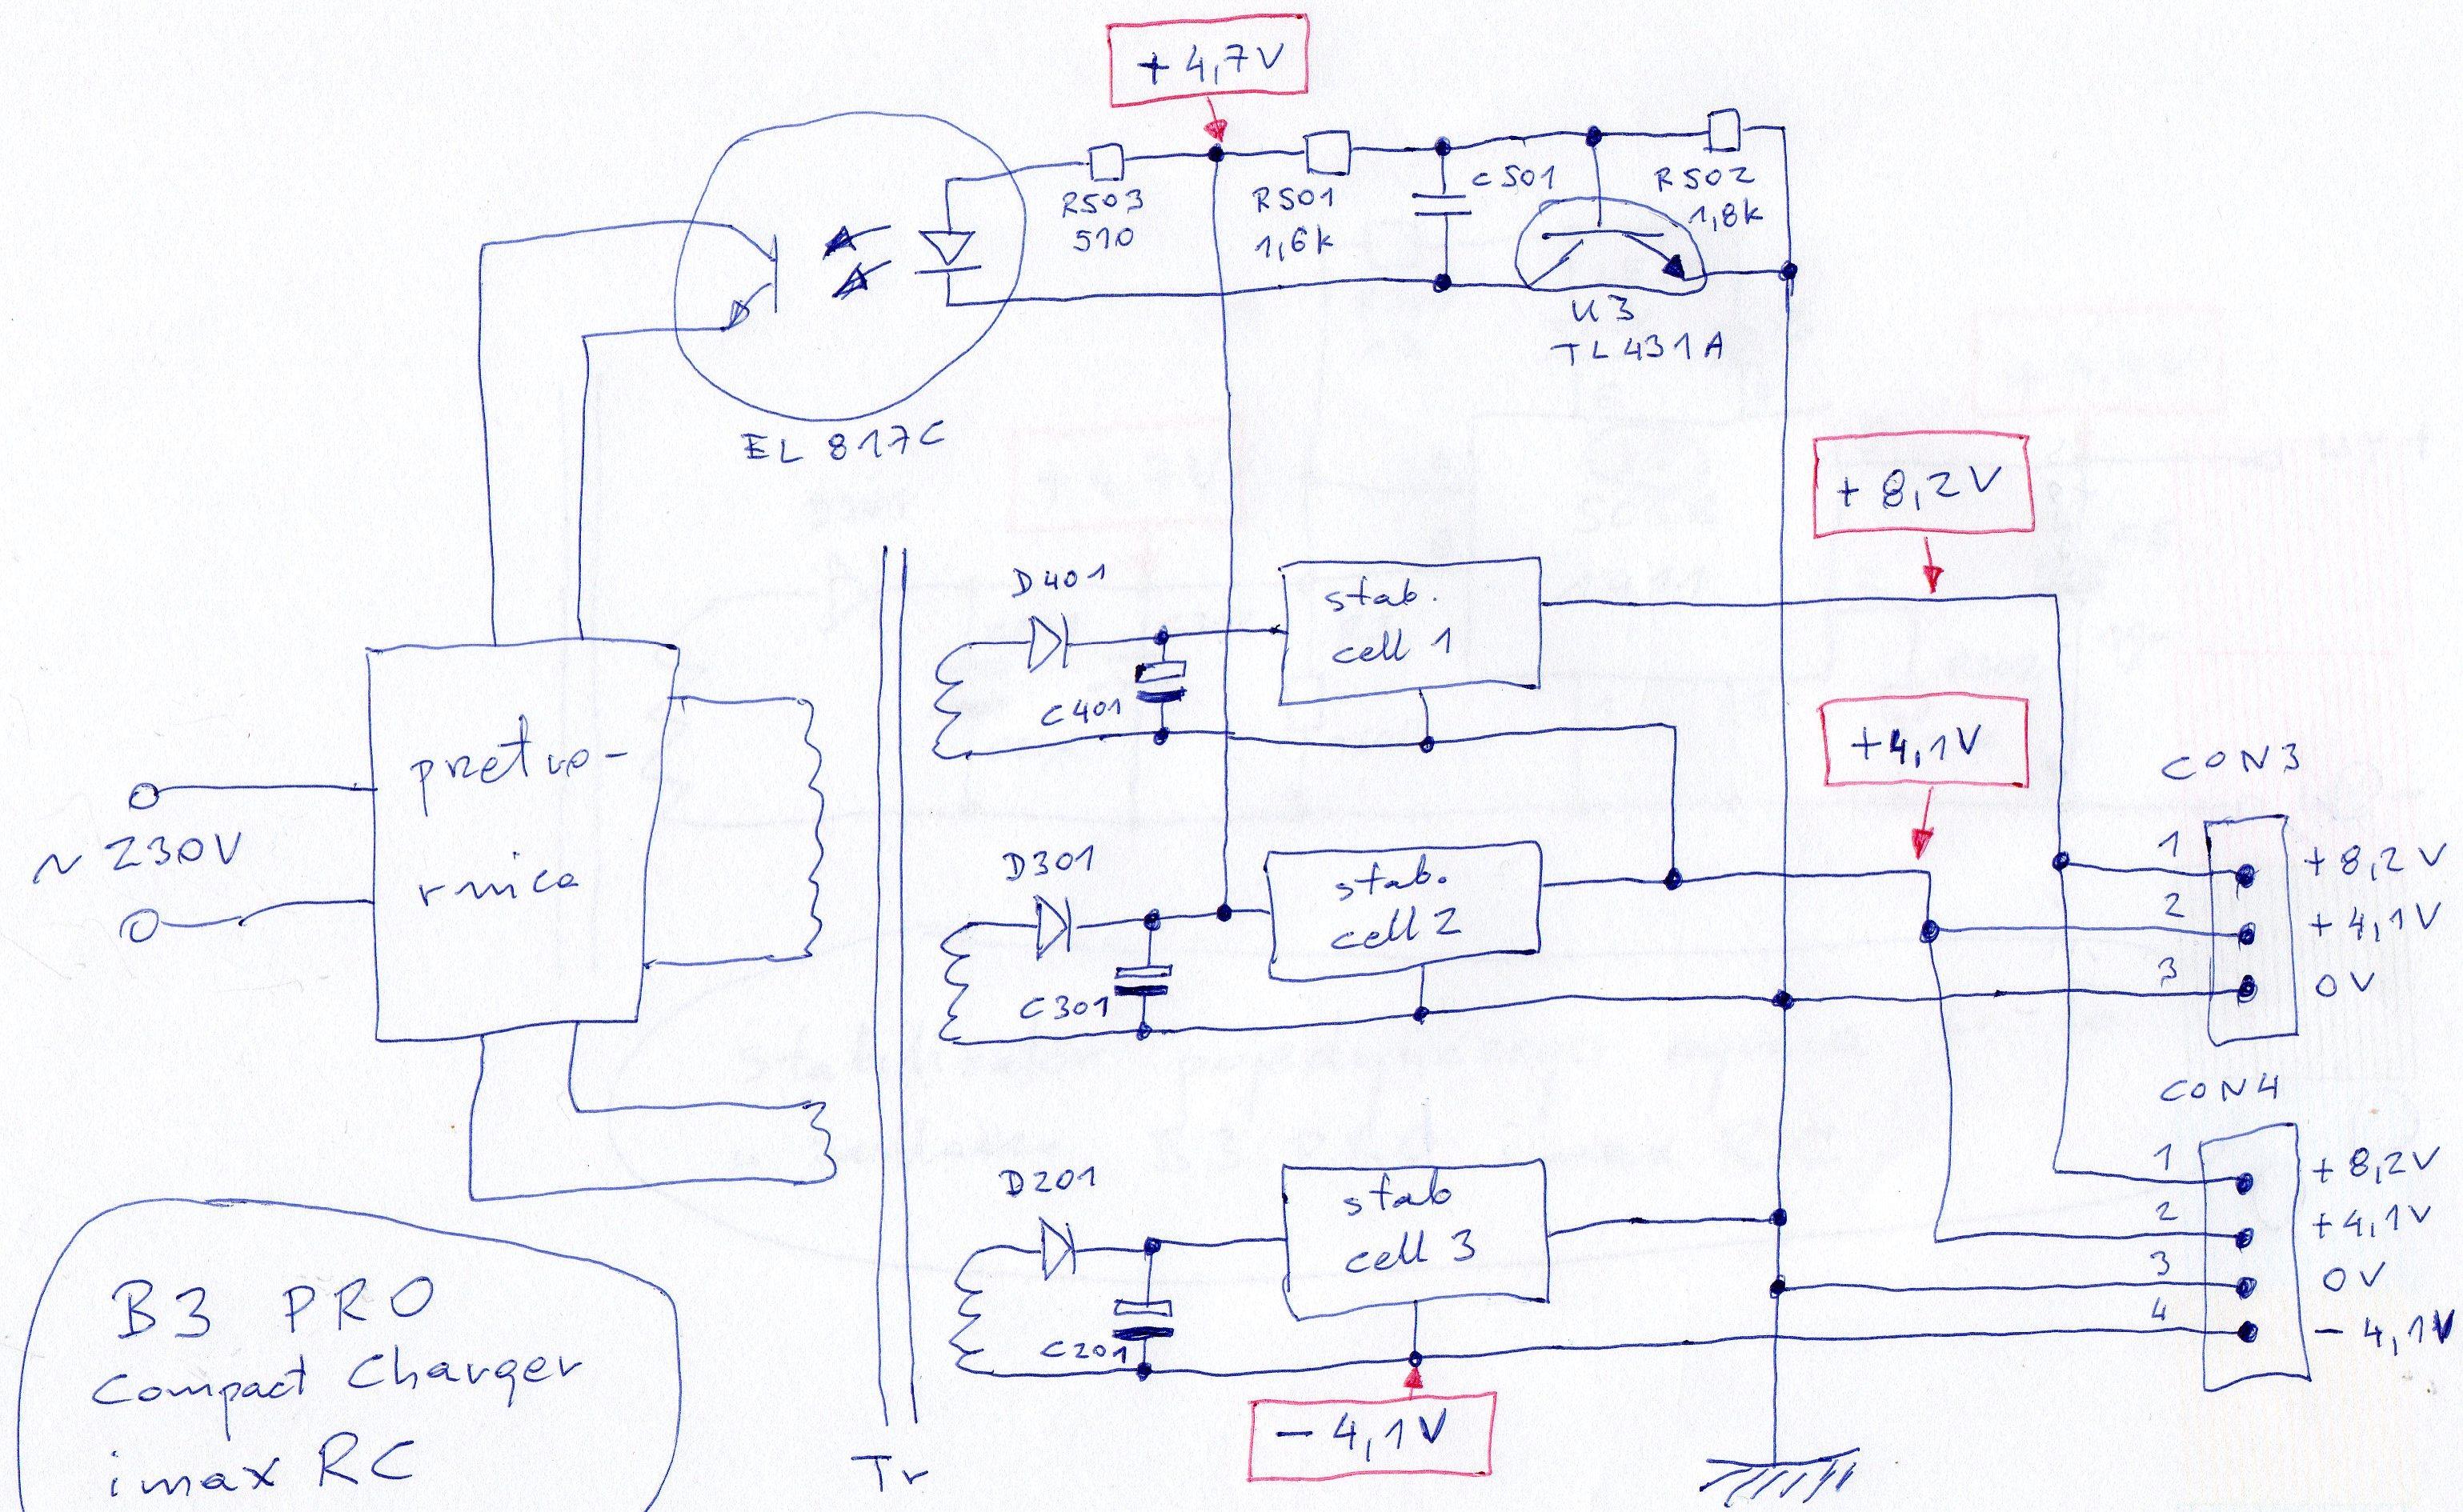 B3 PRO Compact Charger imax RC - naprawa